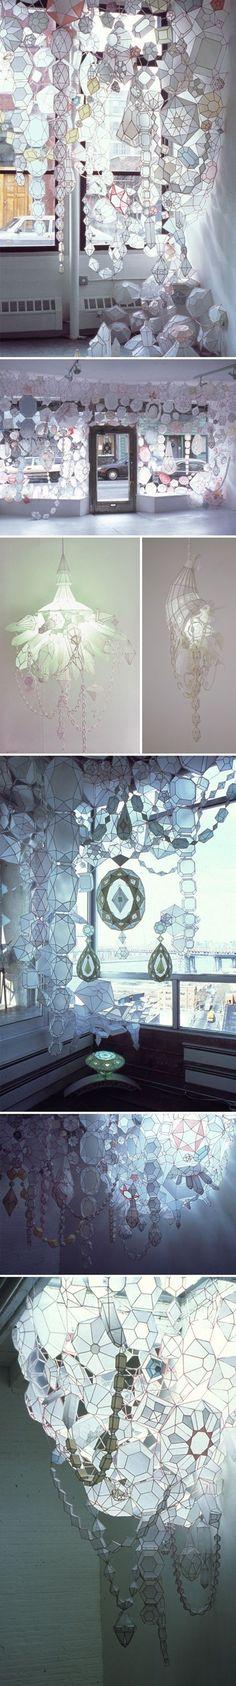 paper/mixed media installation artist Kirsten Hassenfeld: